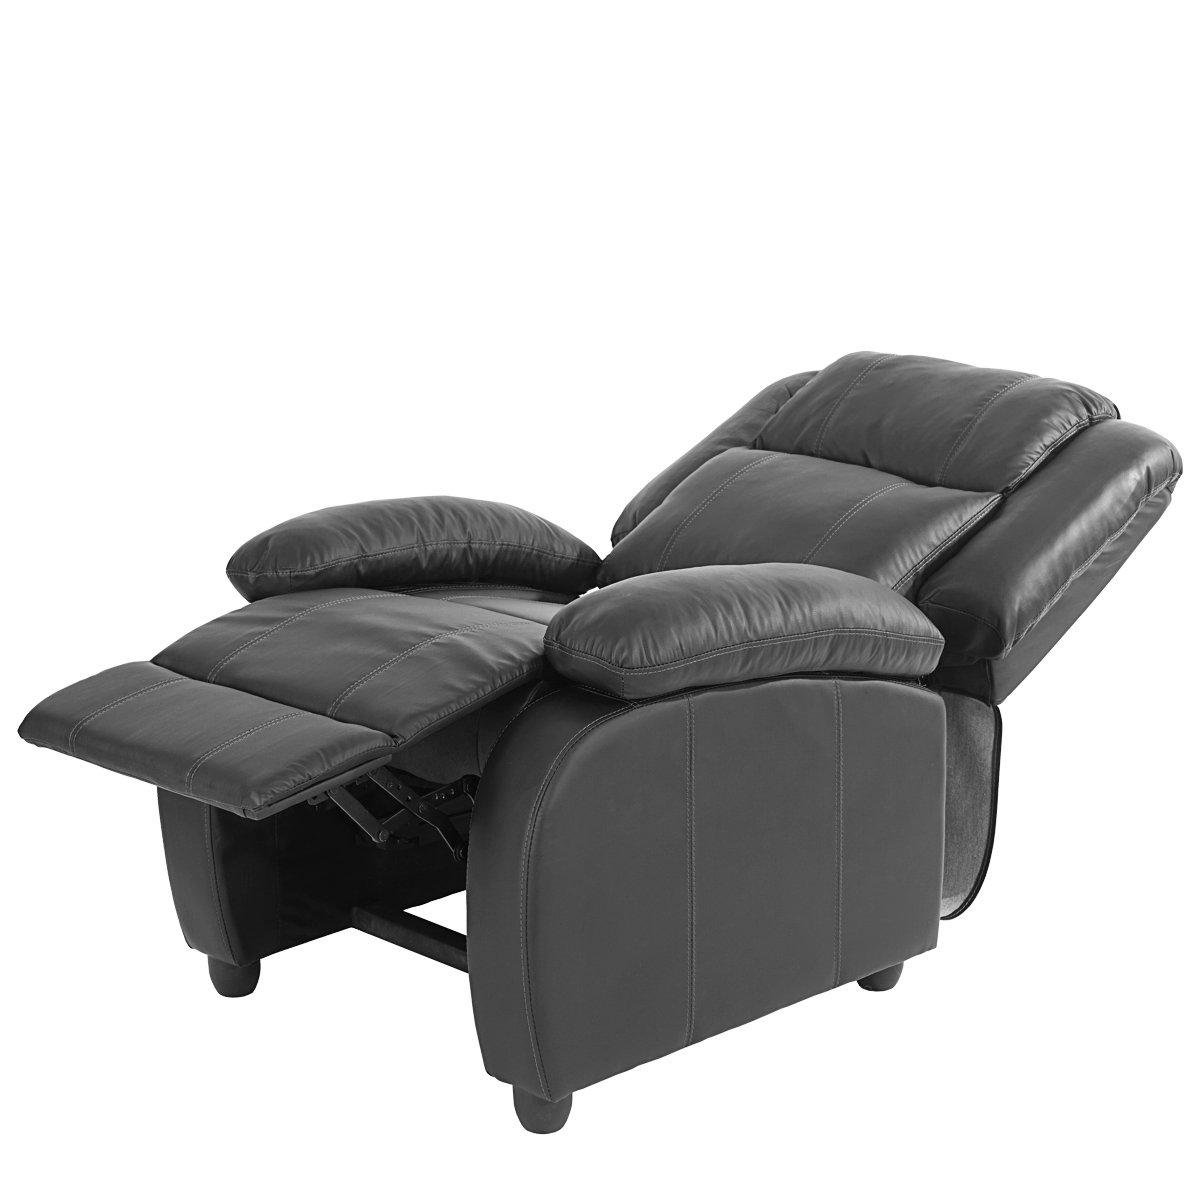 Sill N Relax Reclinable Lincon En Color Negro Sillon